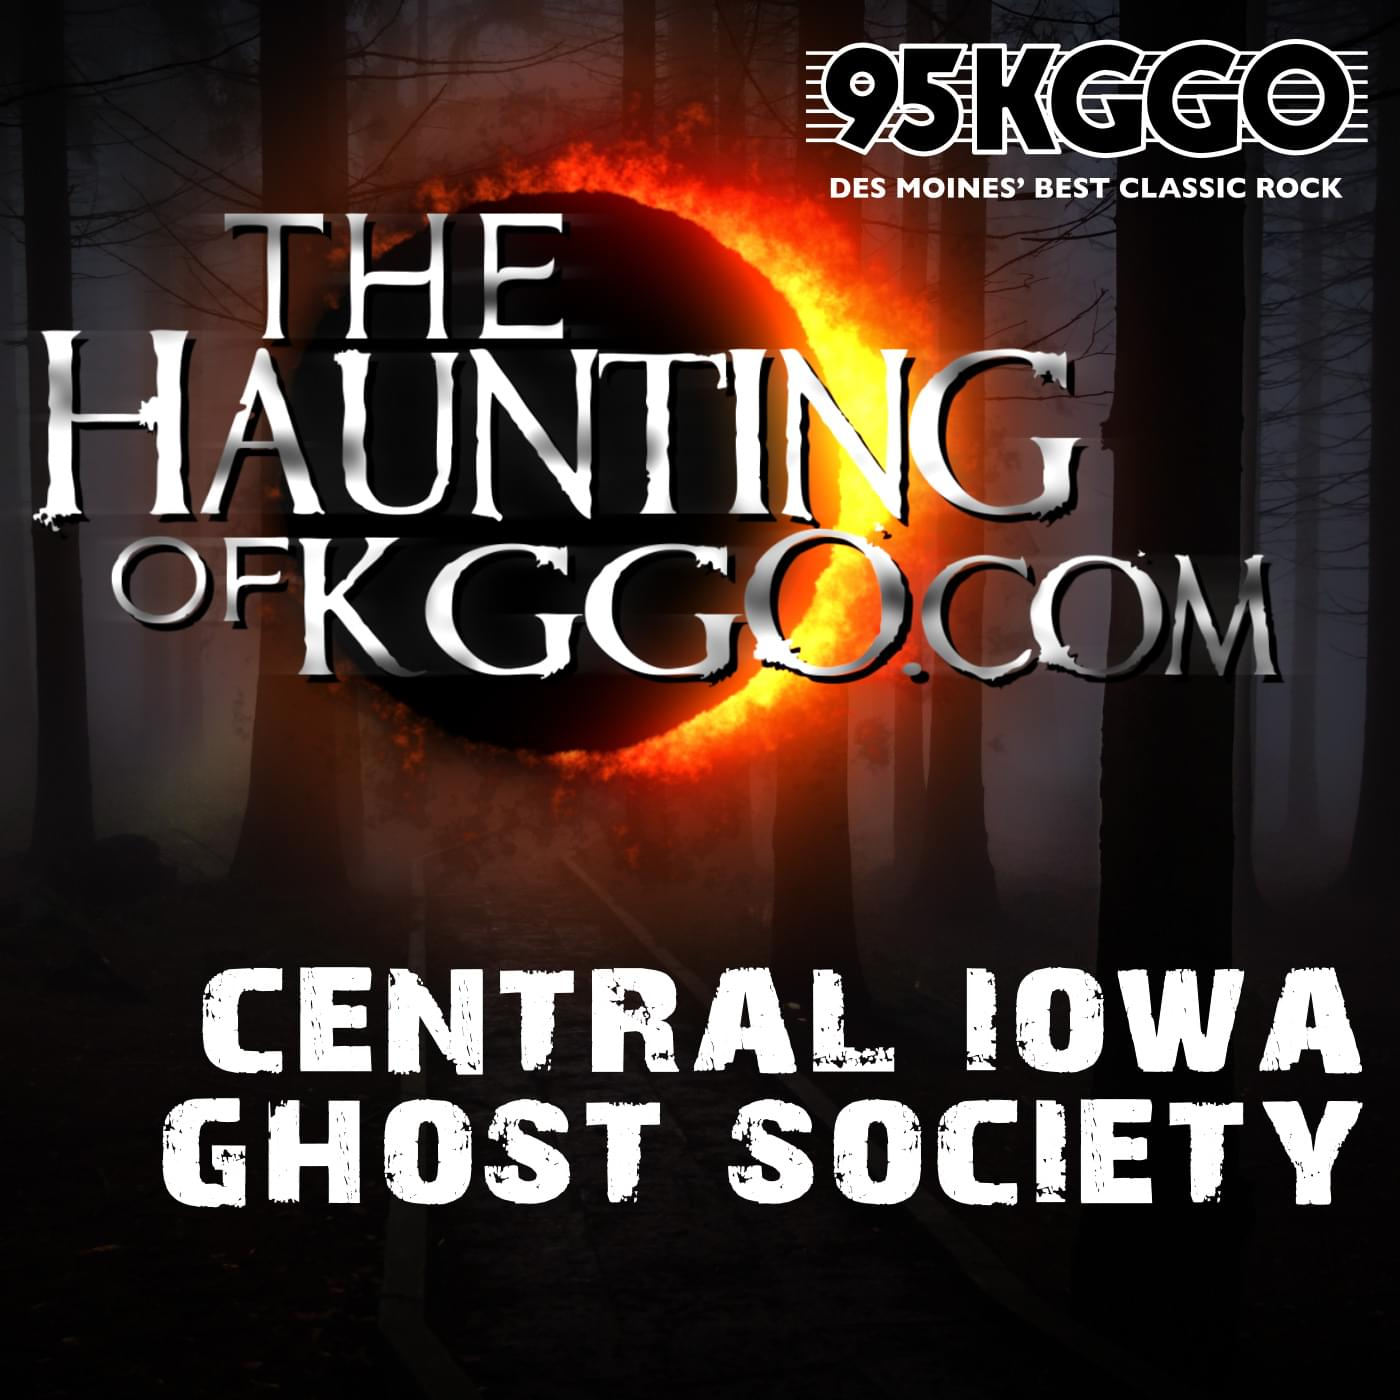 Haunting of KGGO.com – Central Iowa Ghost Society